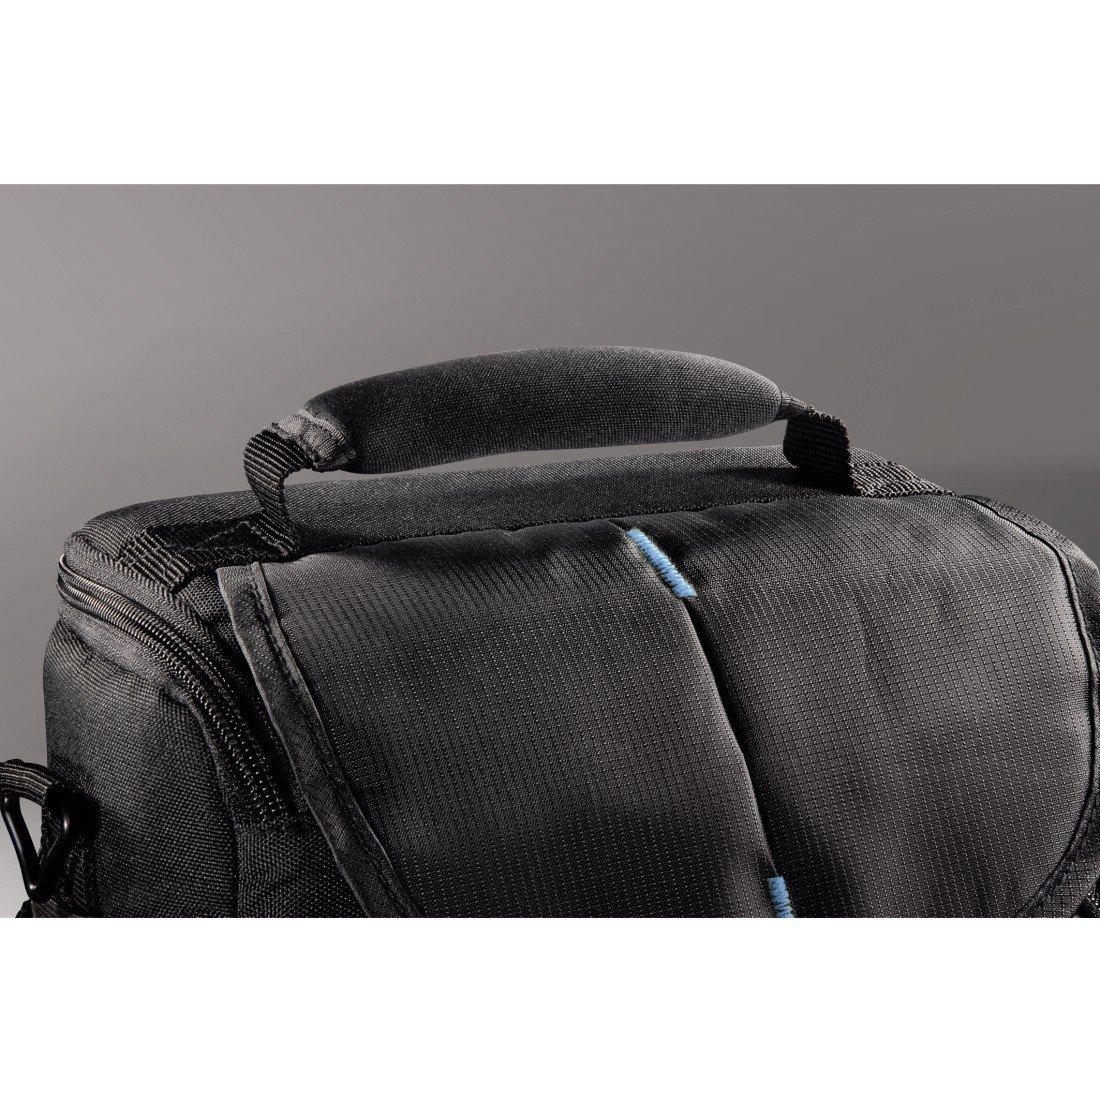 32d187eef467e Hama torba canberra 110 colt czarna niebieska + gratis - Torby ...